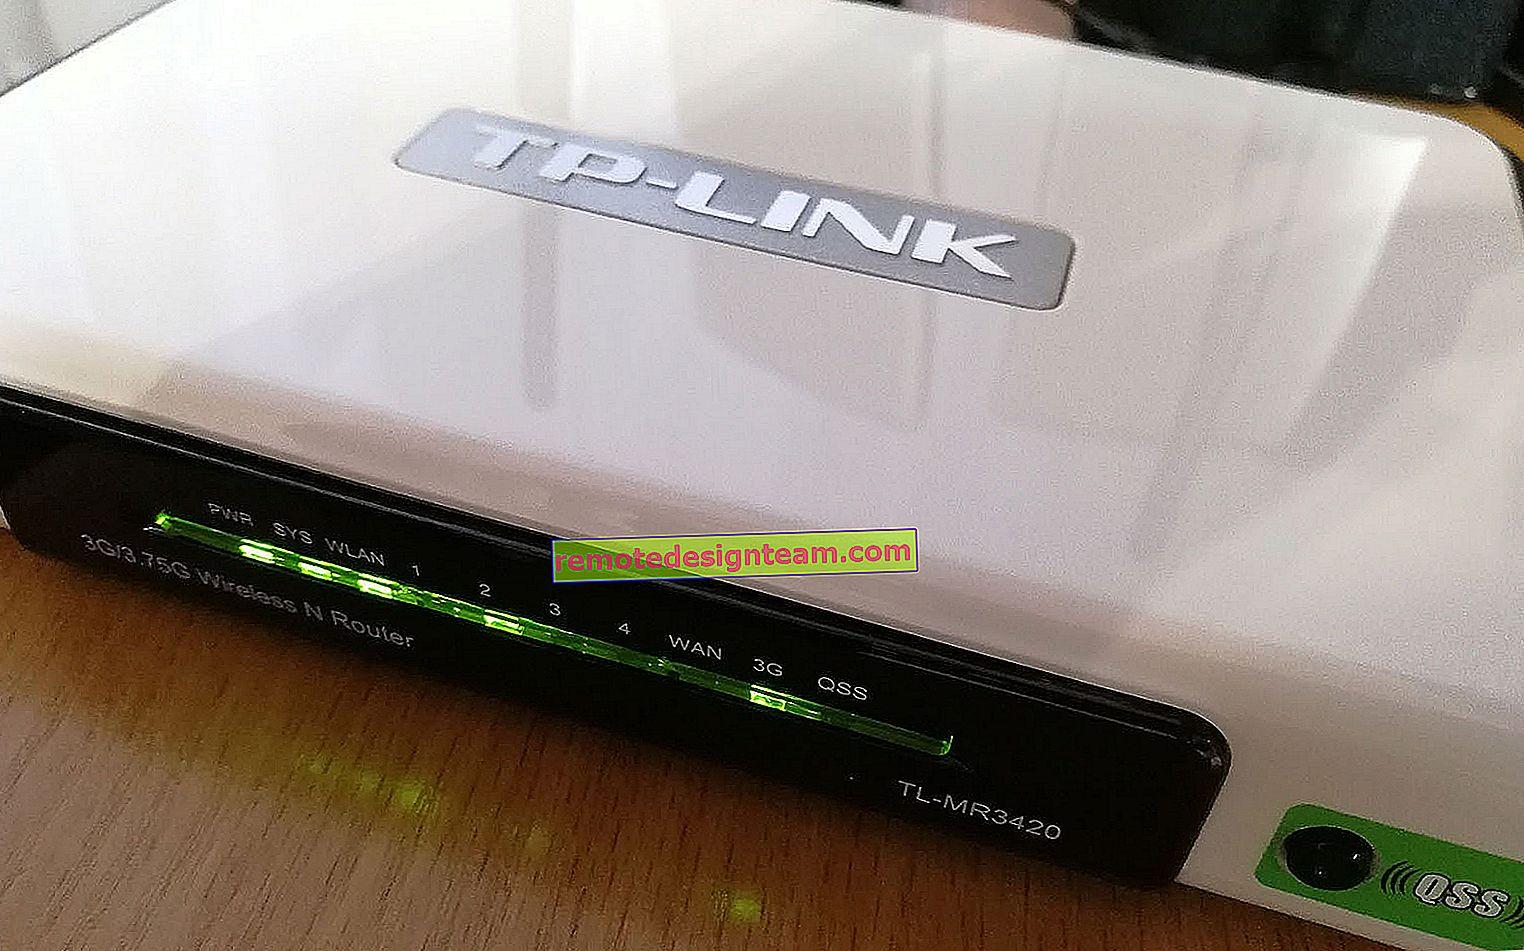 Instrukcje konfiguracji routera mobilnego TP-LINK M5250